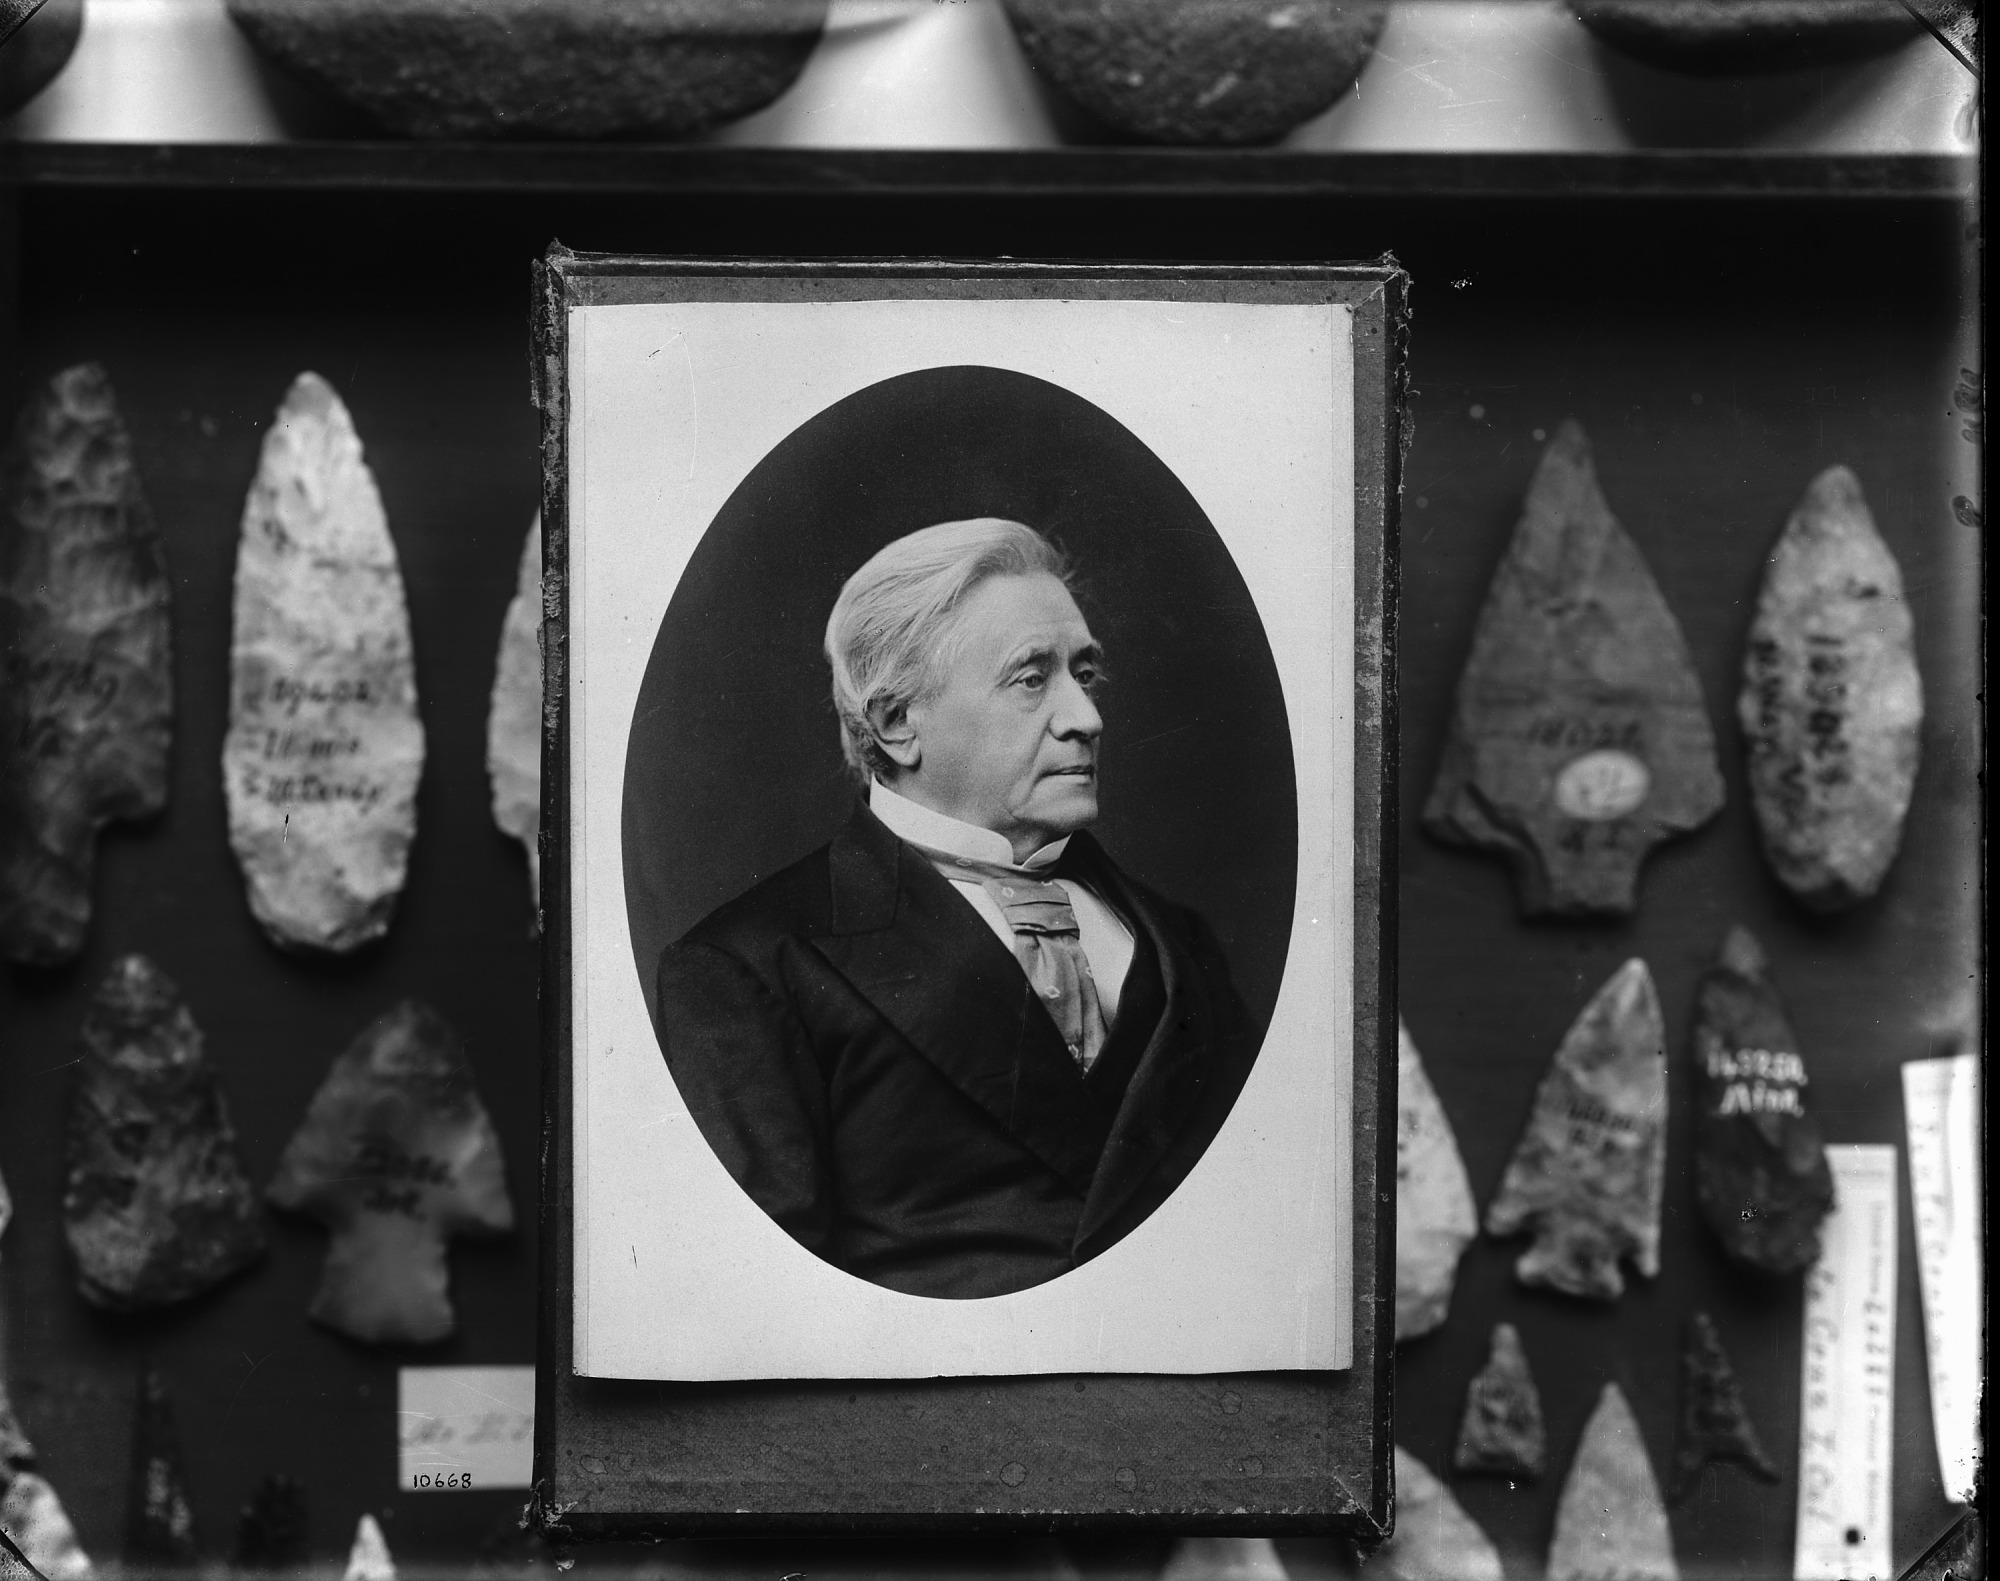 Portrait of Joseph Henry, by Fassett, 1875, Smithsonian Archives - History Div, 10668 or MAH-10668.